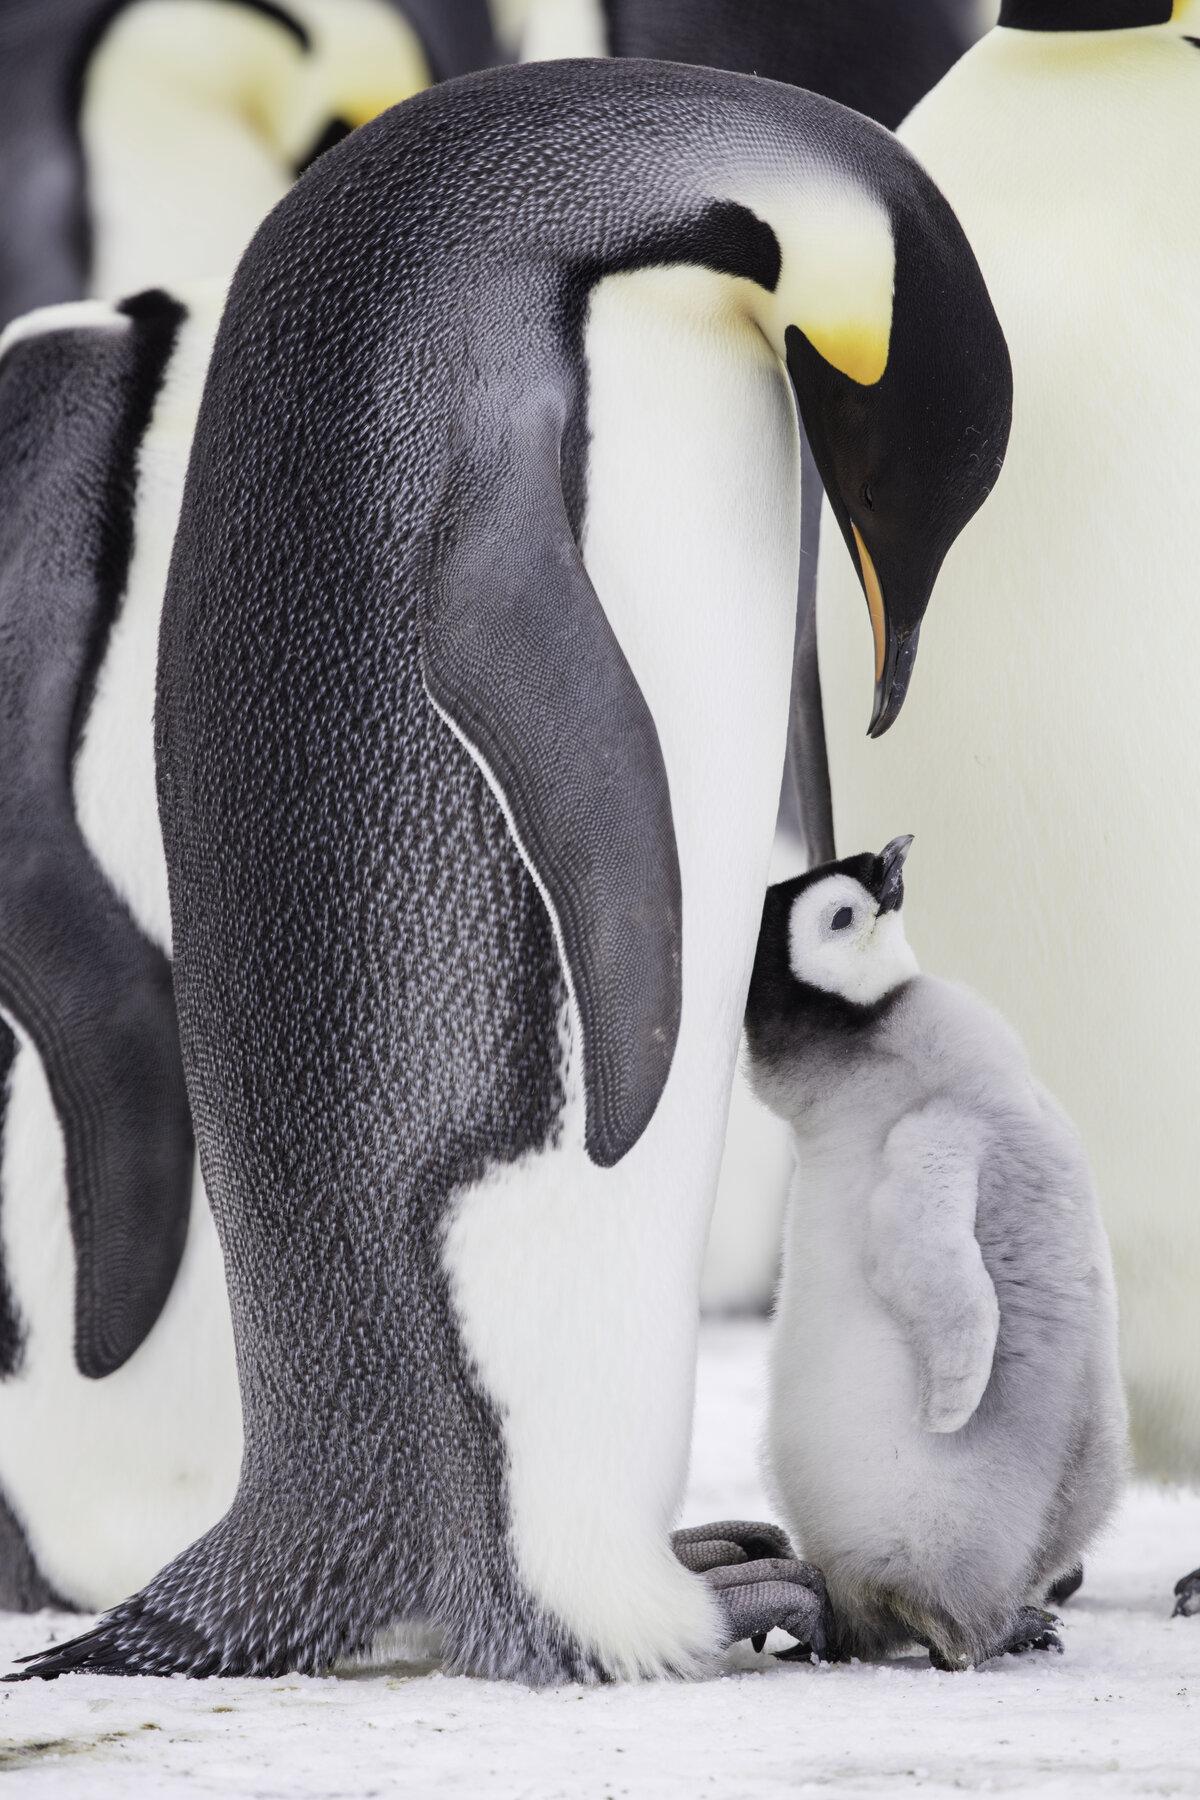 Adult emperor penguin leans over a begging chick